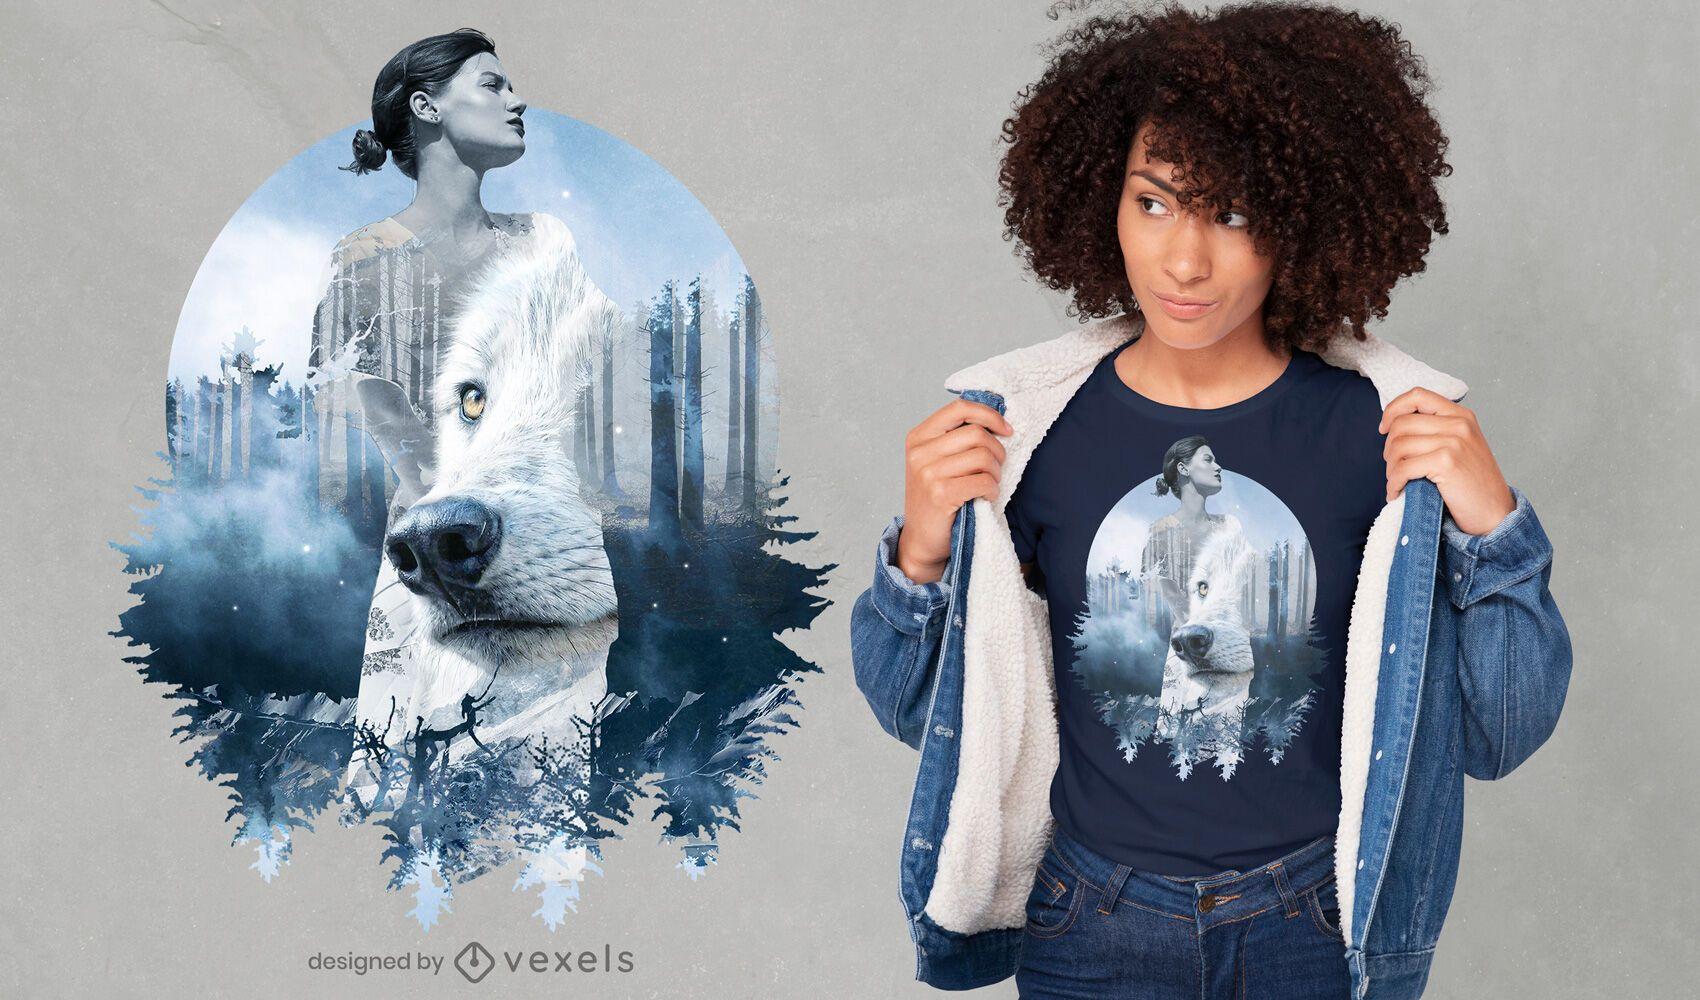 Diseño de camiseta PSD de doble exposición de niña y lobo.